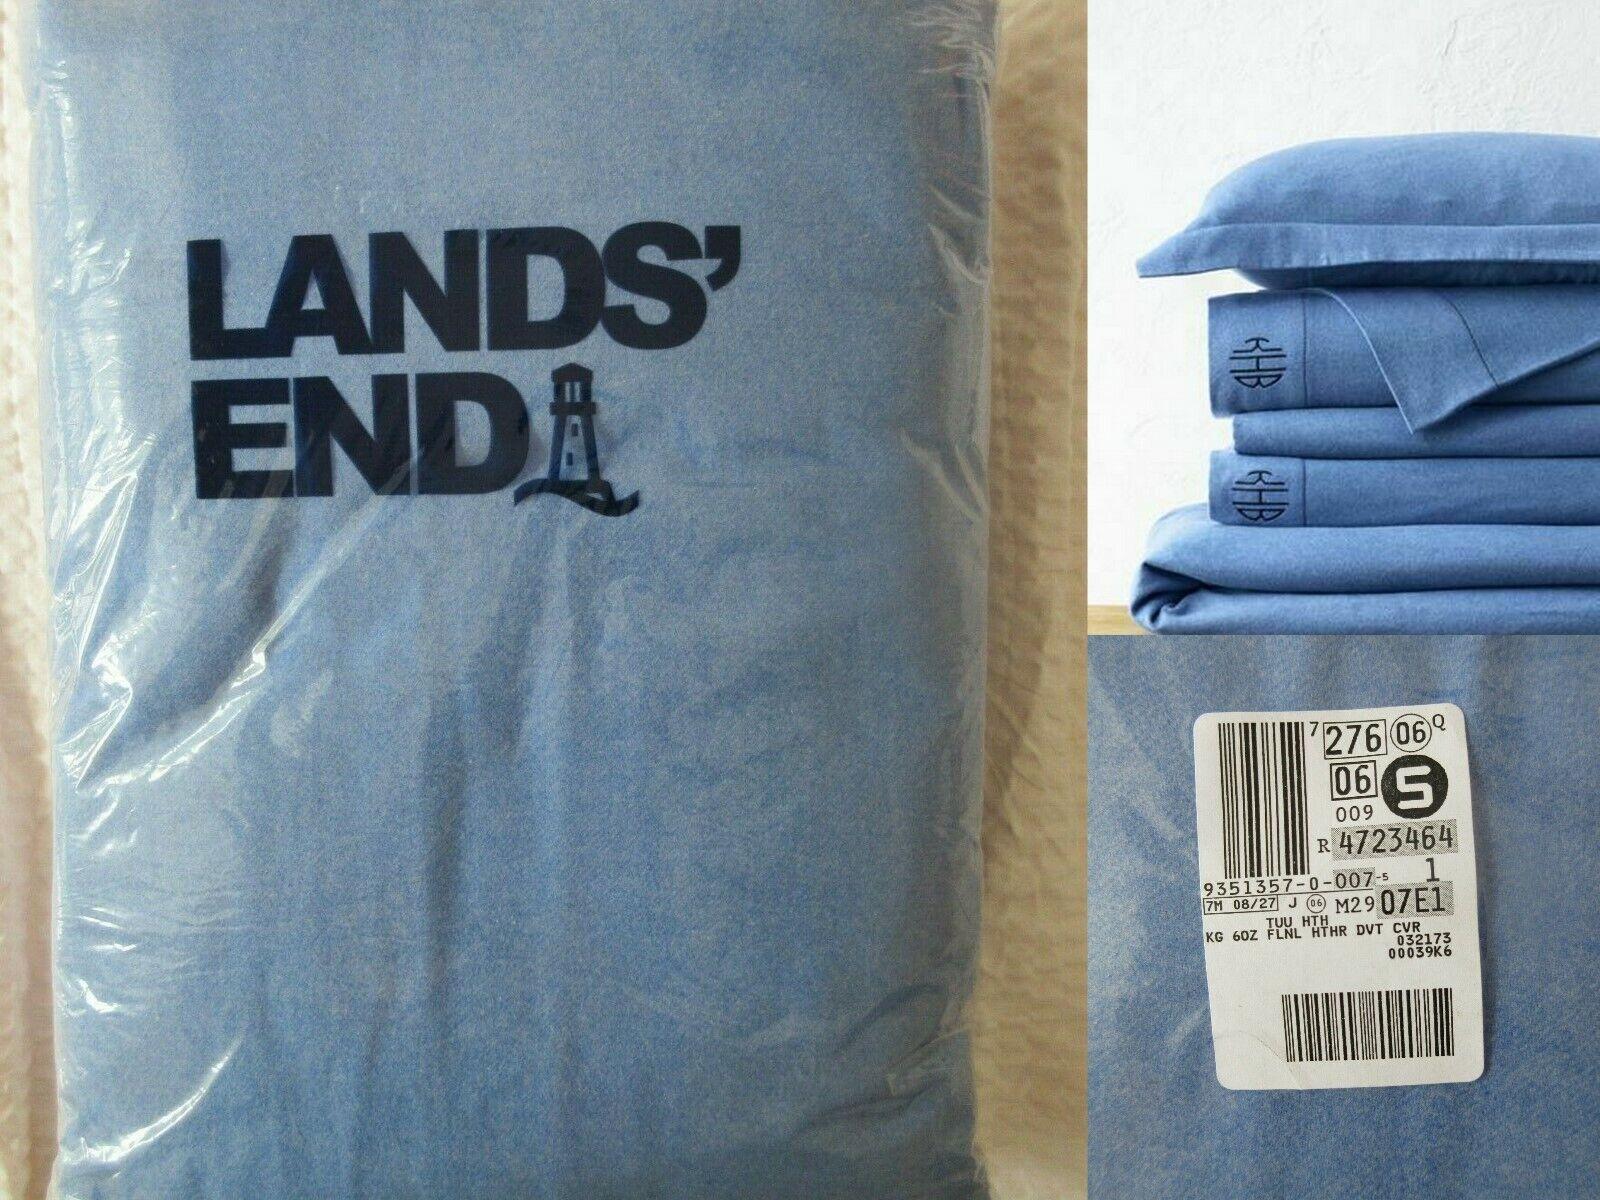 239 NWT Lands End 6oz 100% Cotton Flannel Duvet Cover King Größe Oeko-Tex Blau